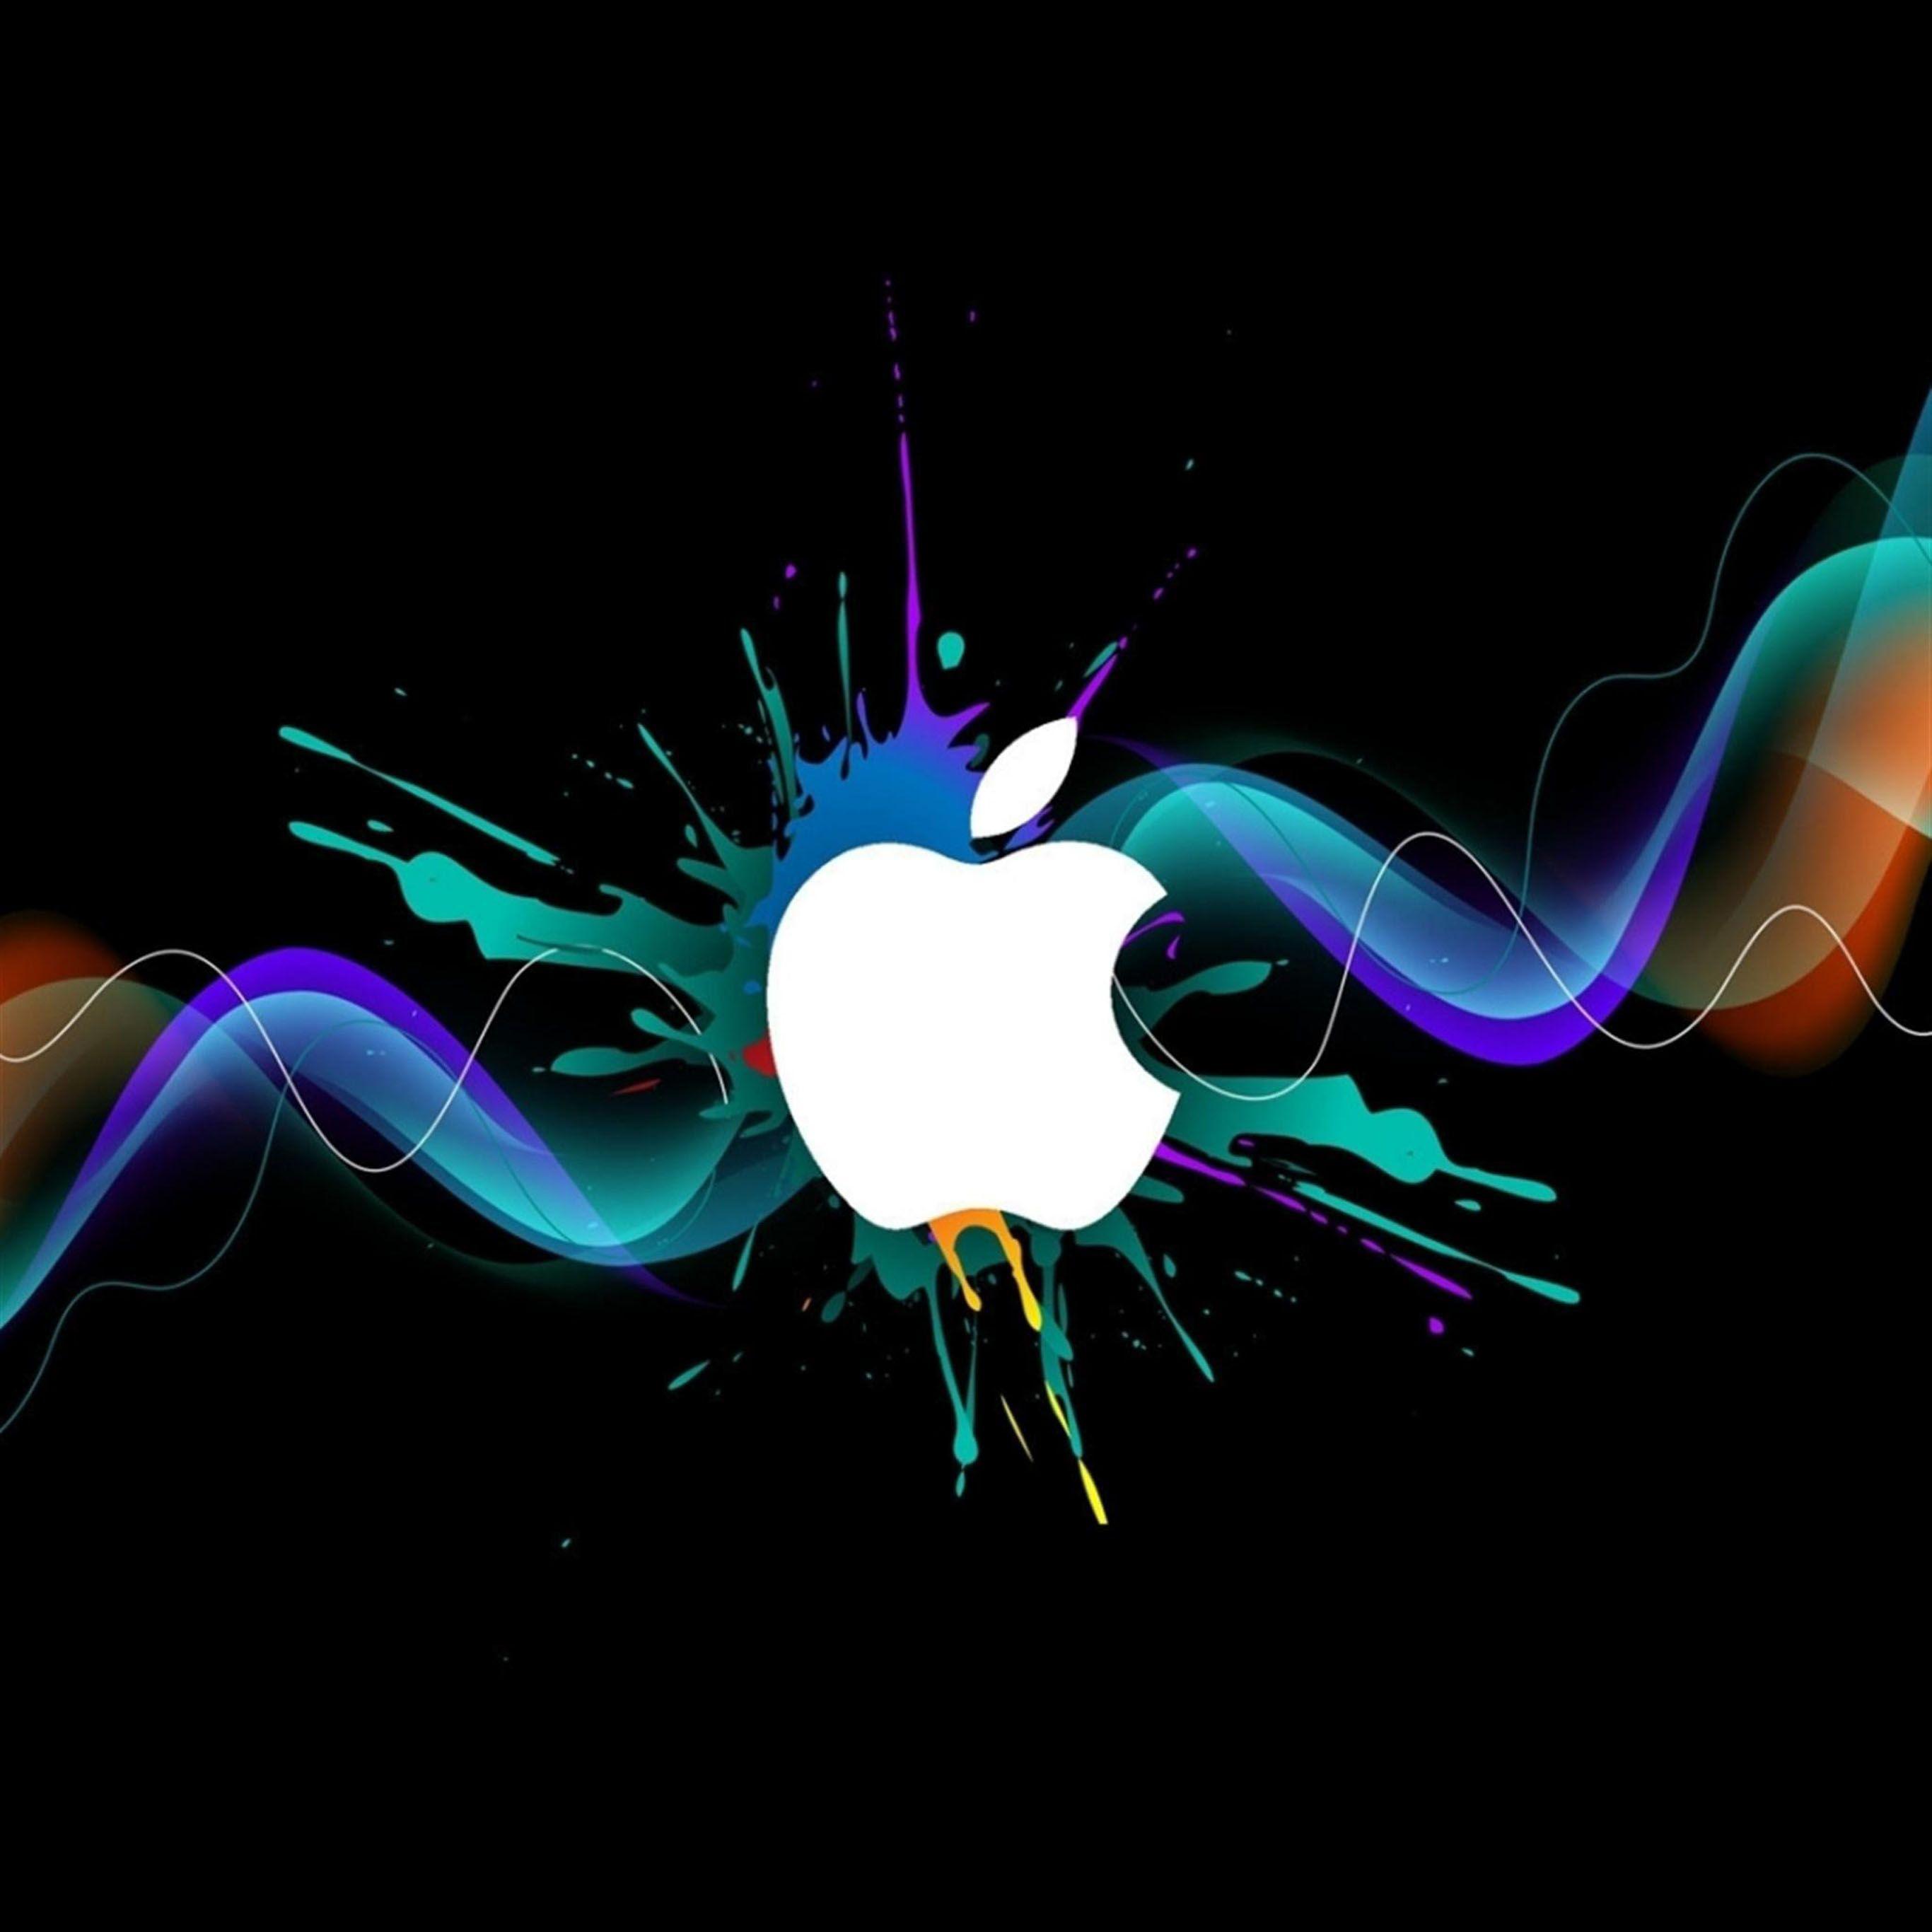 Apple iPad Pro Wallpaper 175 Apple logo wallpaper iphone Apple 2732x2732